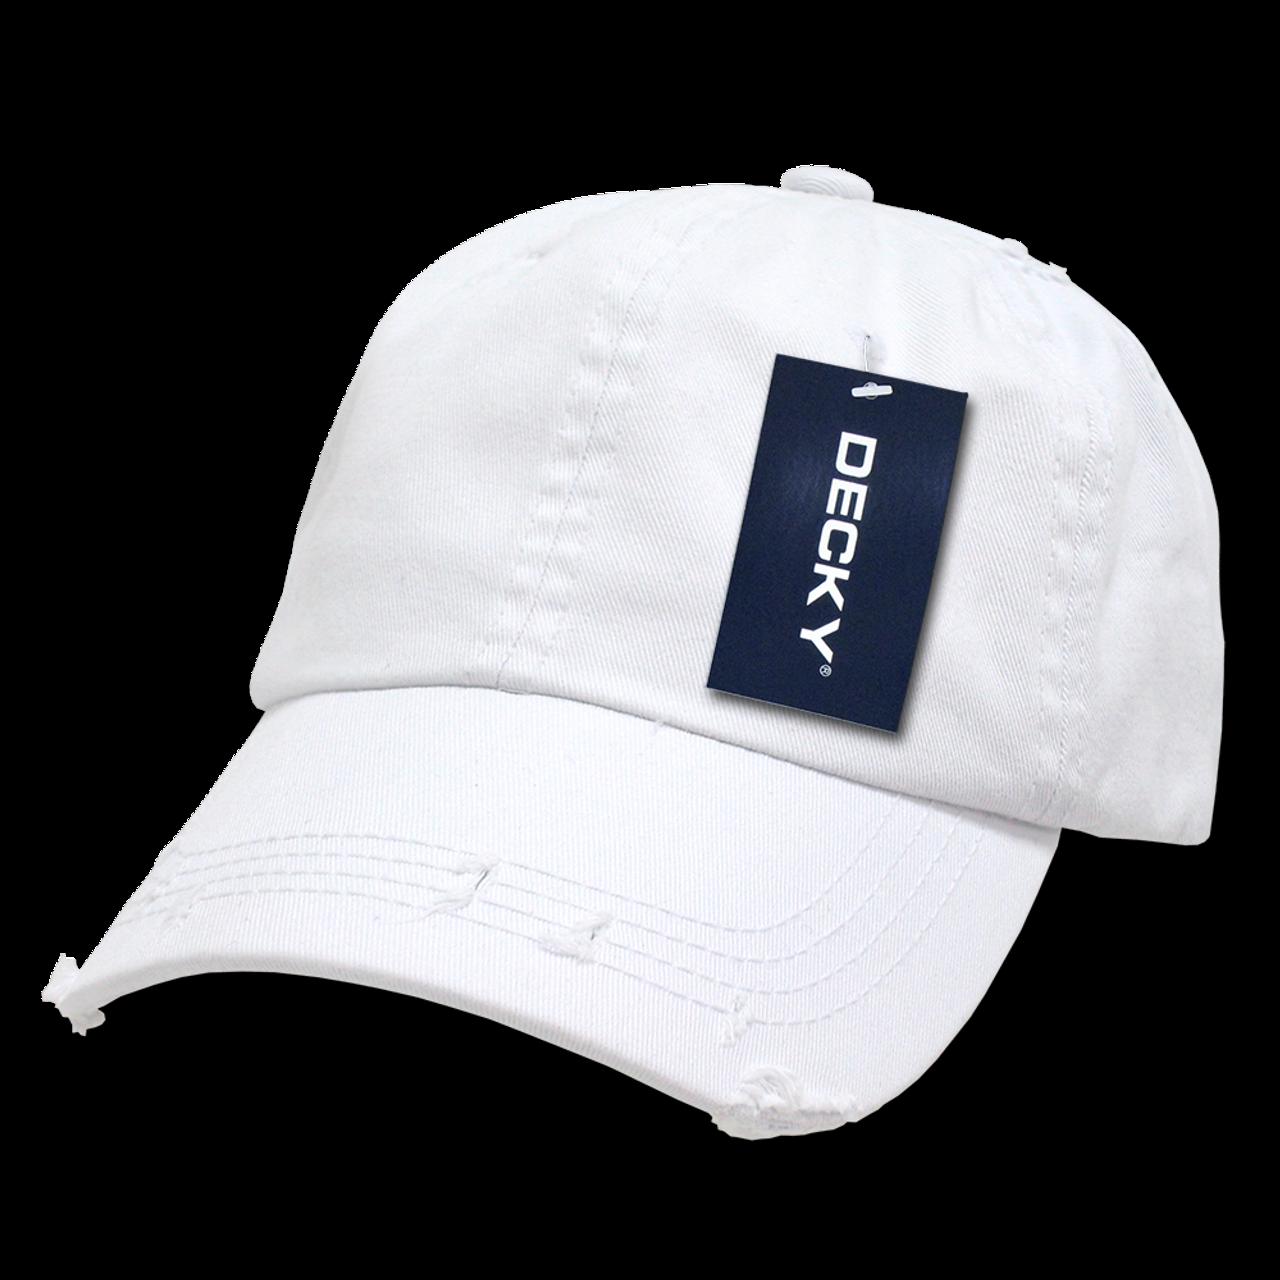 Vintage Frayed Polo Cap - White - U.S. Military Hats.com f8da2704a9a0